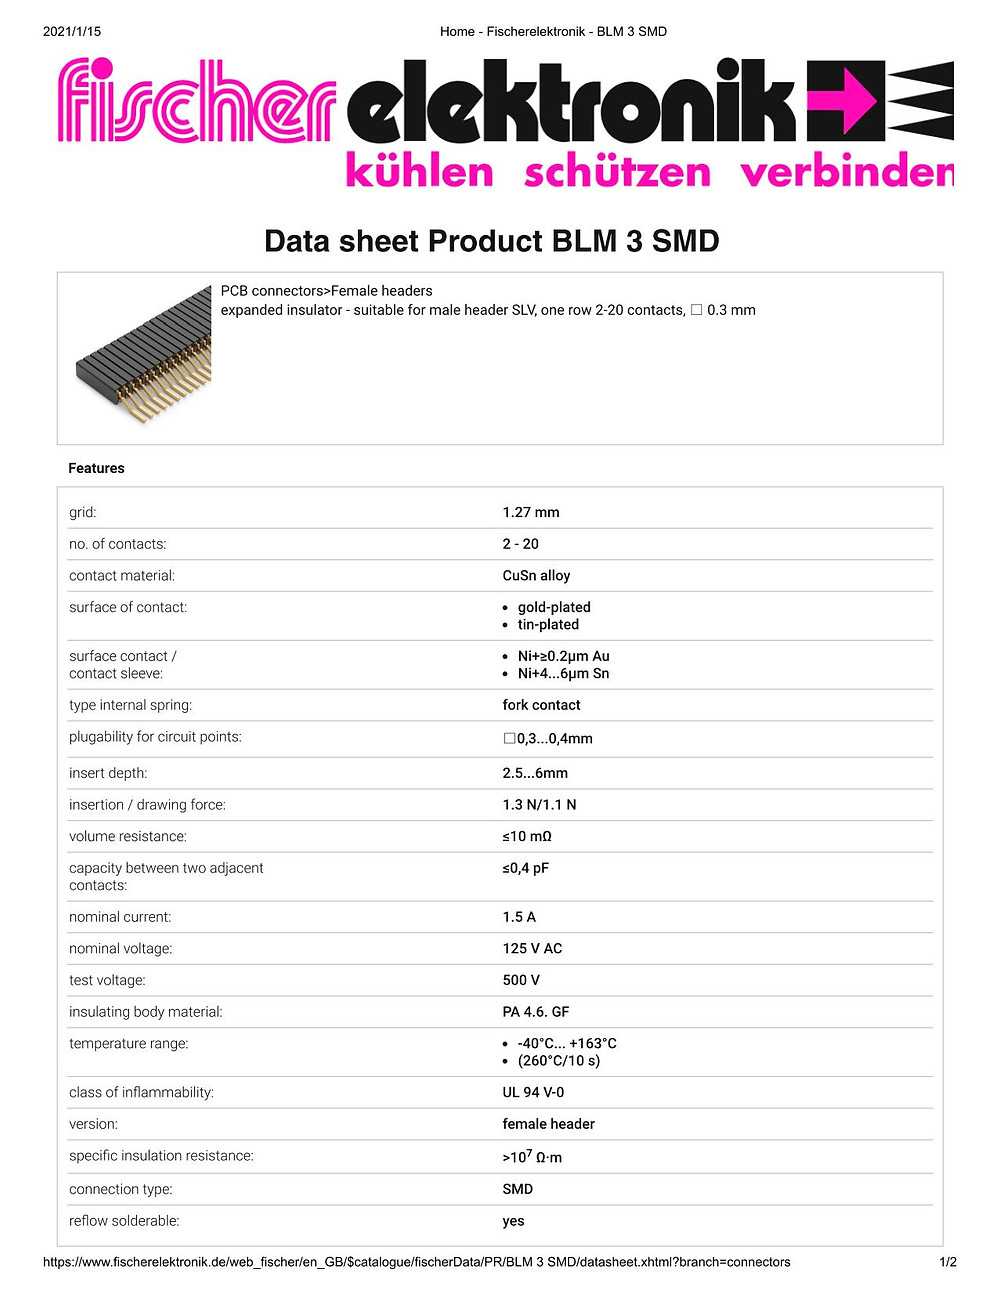 BLM 3 SMD 連結ソケット 1.27mm ピッチ 平行連結用